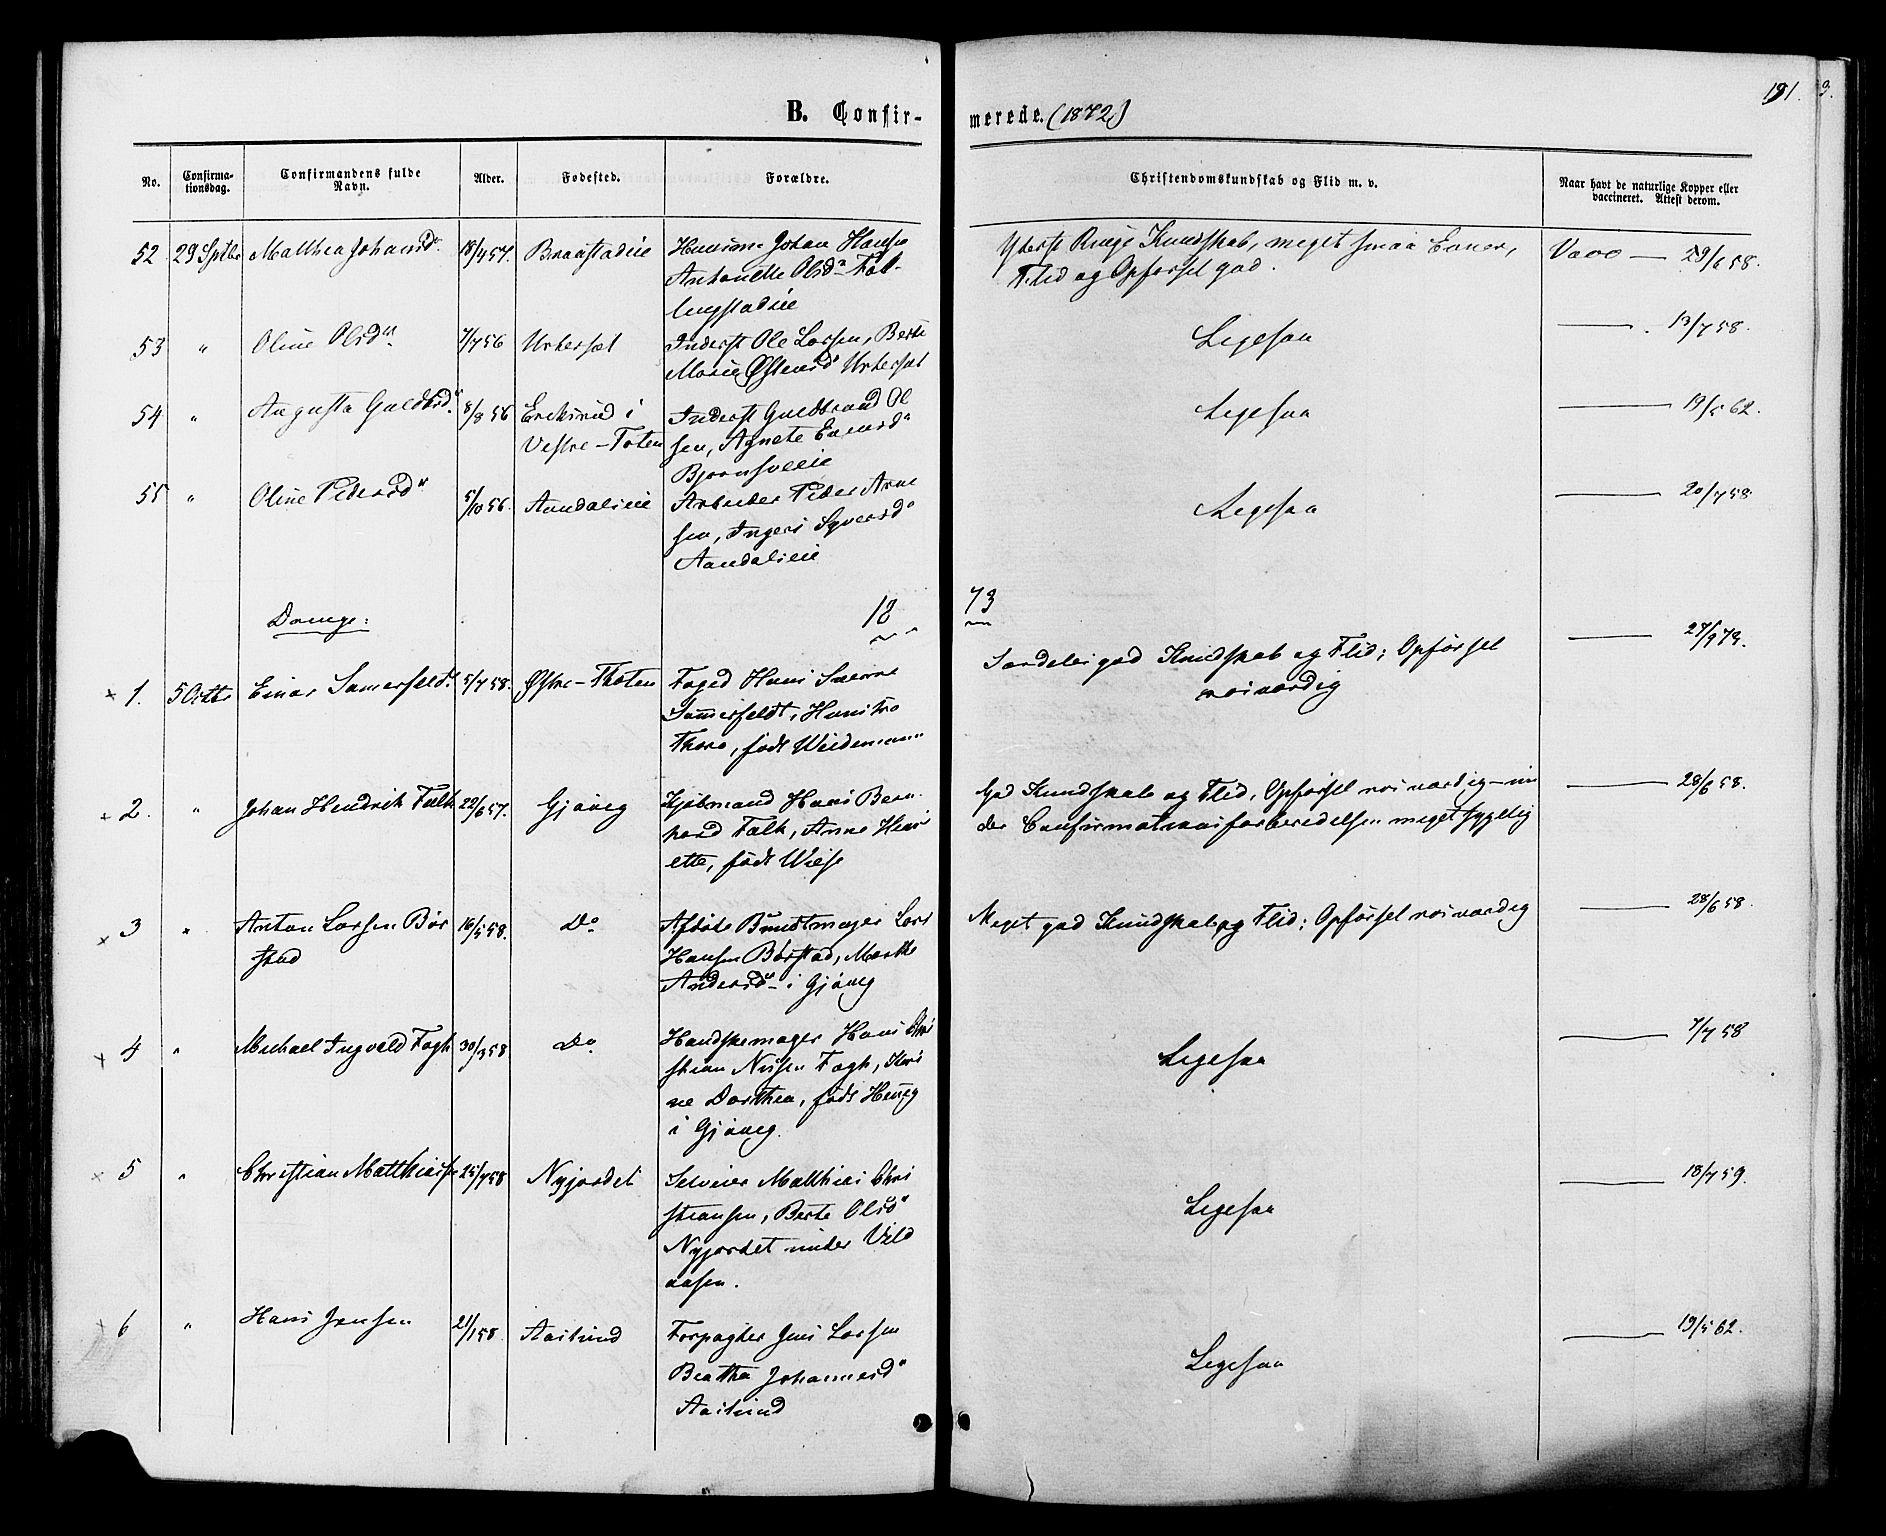 SAH, Vardal prestekontor, H/Ha/Haa/L0007: Ministerialbok nr. 7, 1867-1878, s. 191